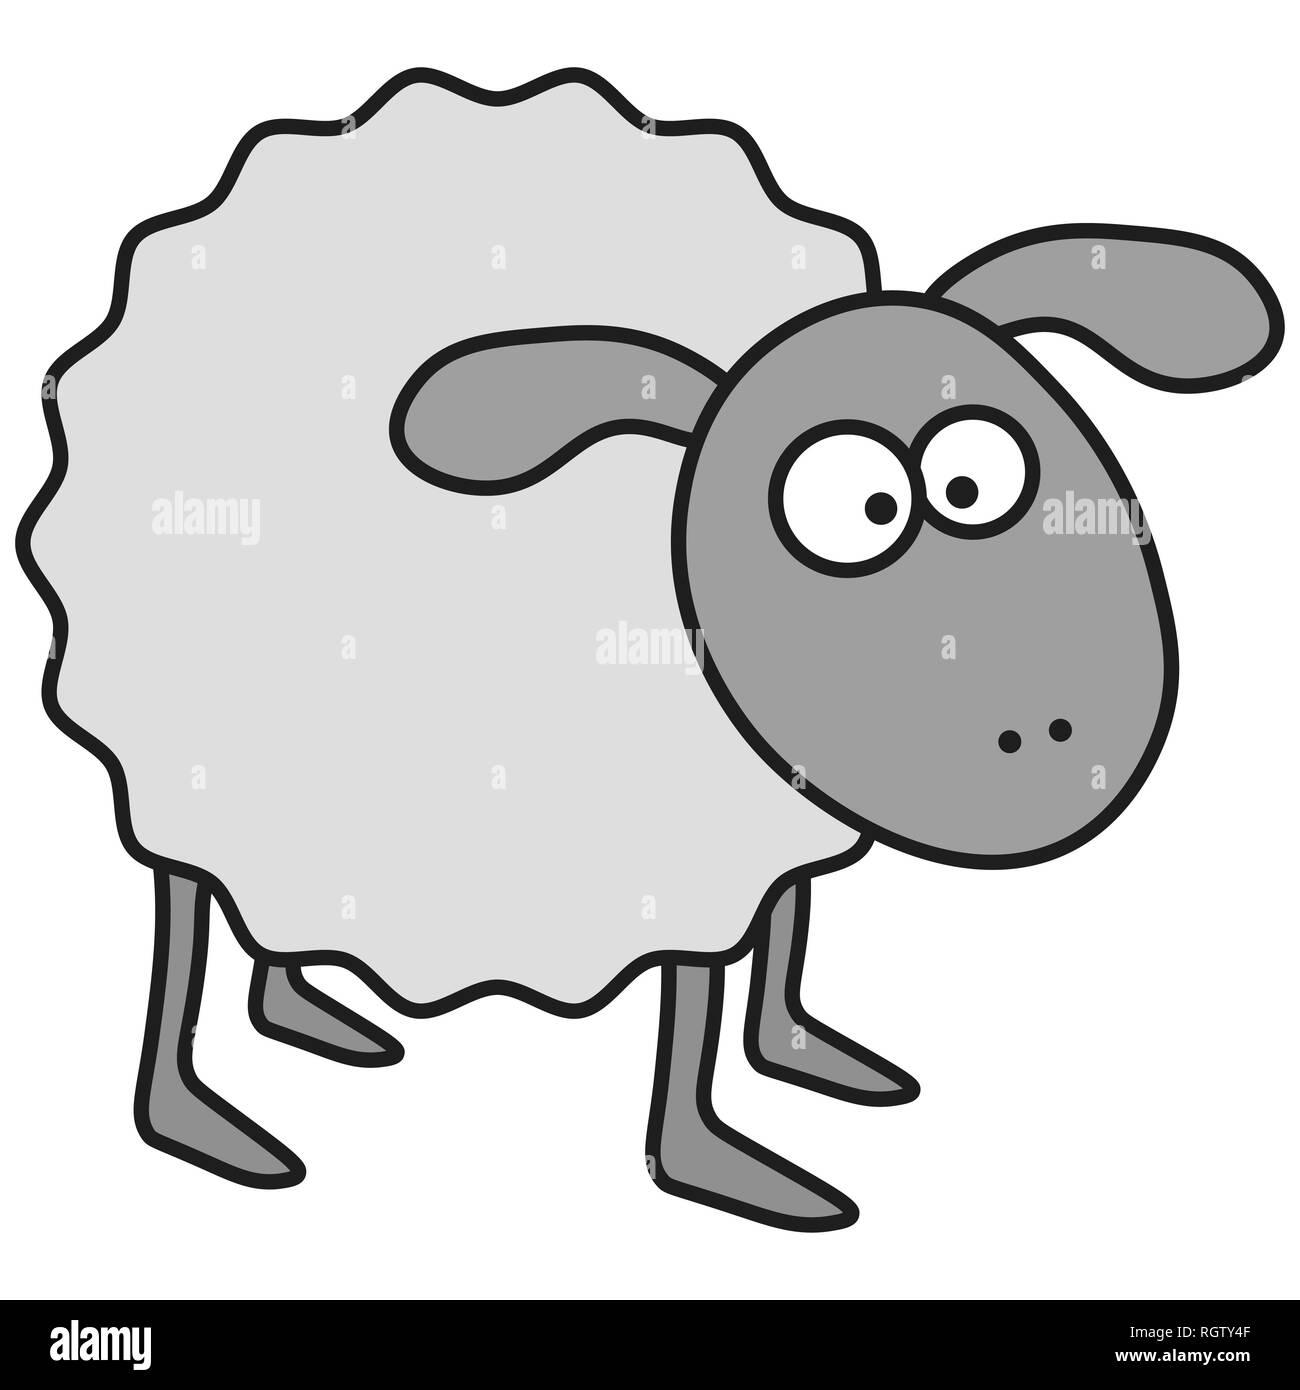 Sheep in cartoon style. On white background,  illustration - Stock Image